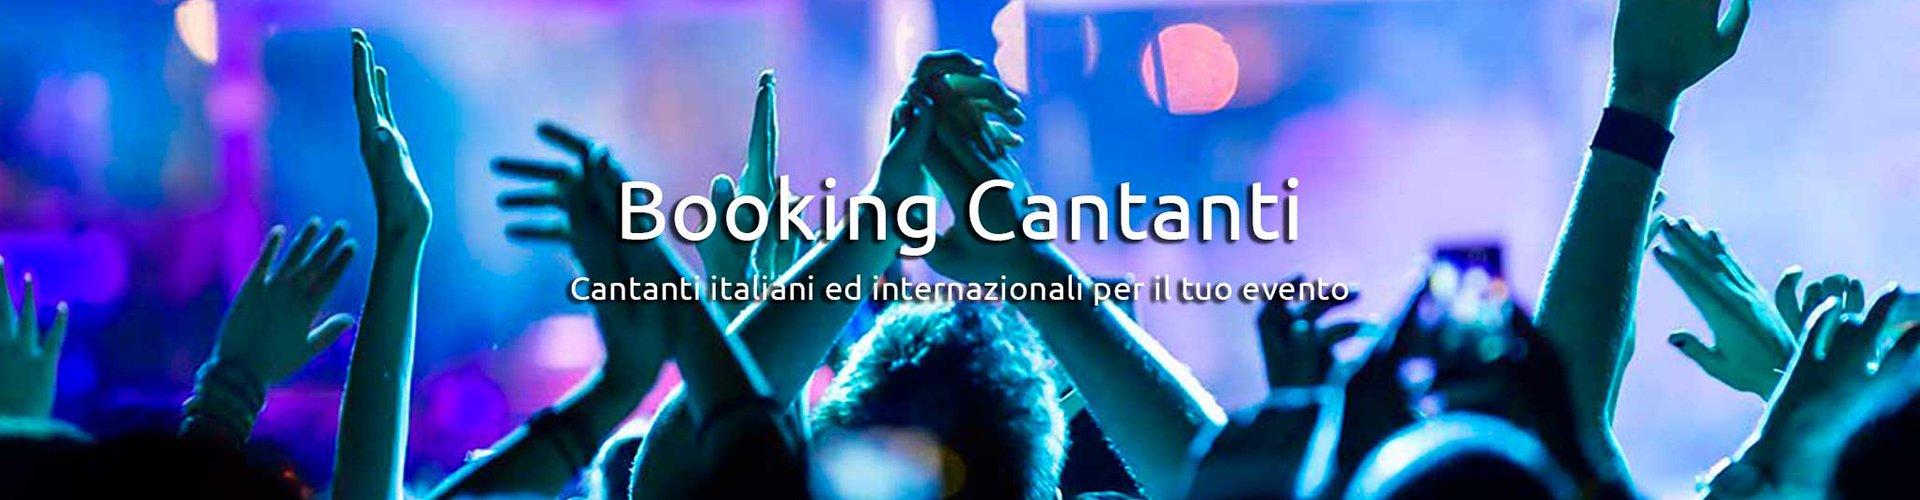 NOSILENCE - Agenzia Booking Cantanti e Management Artisti